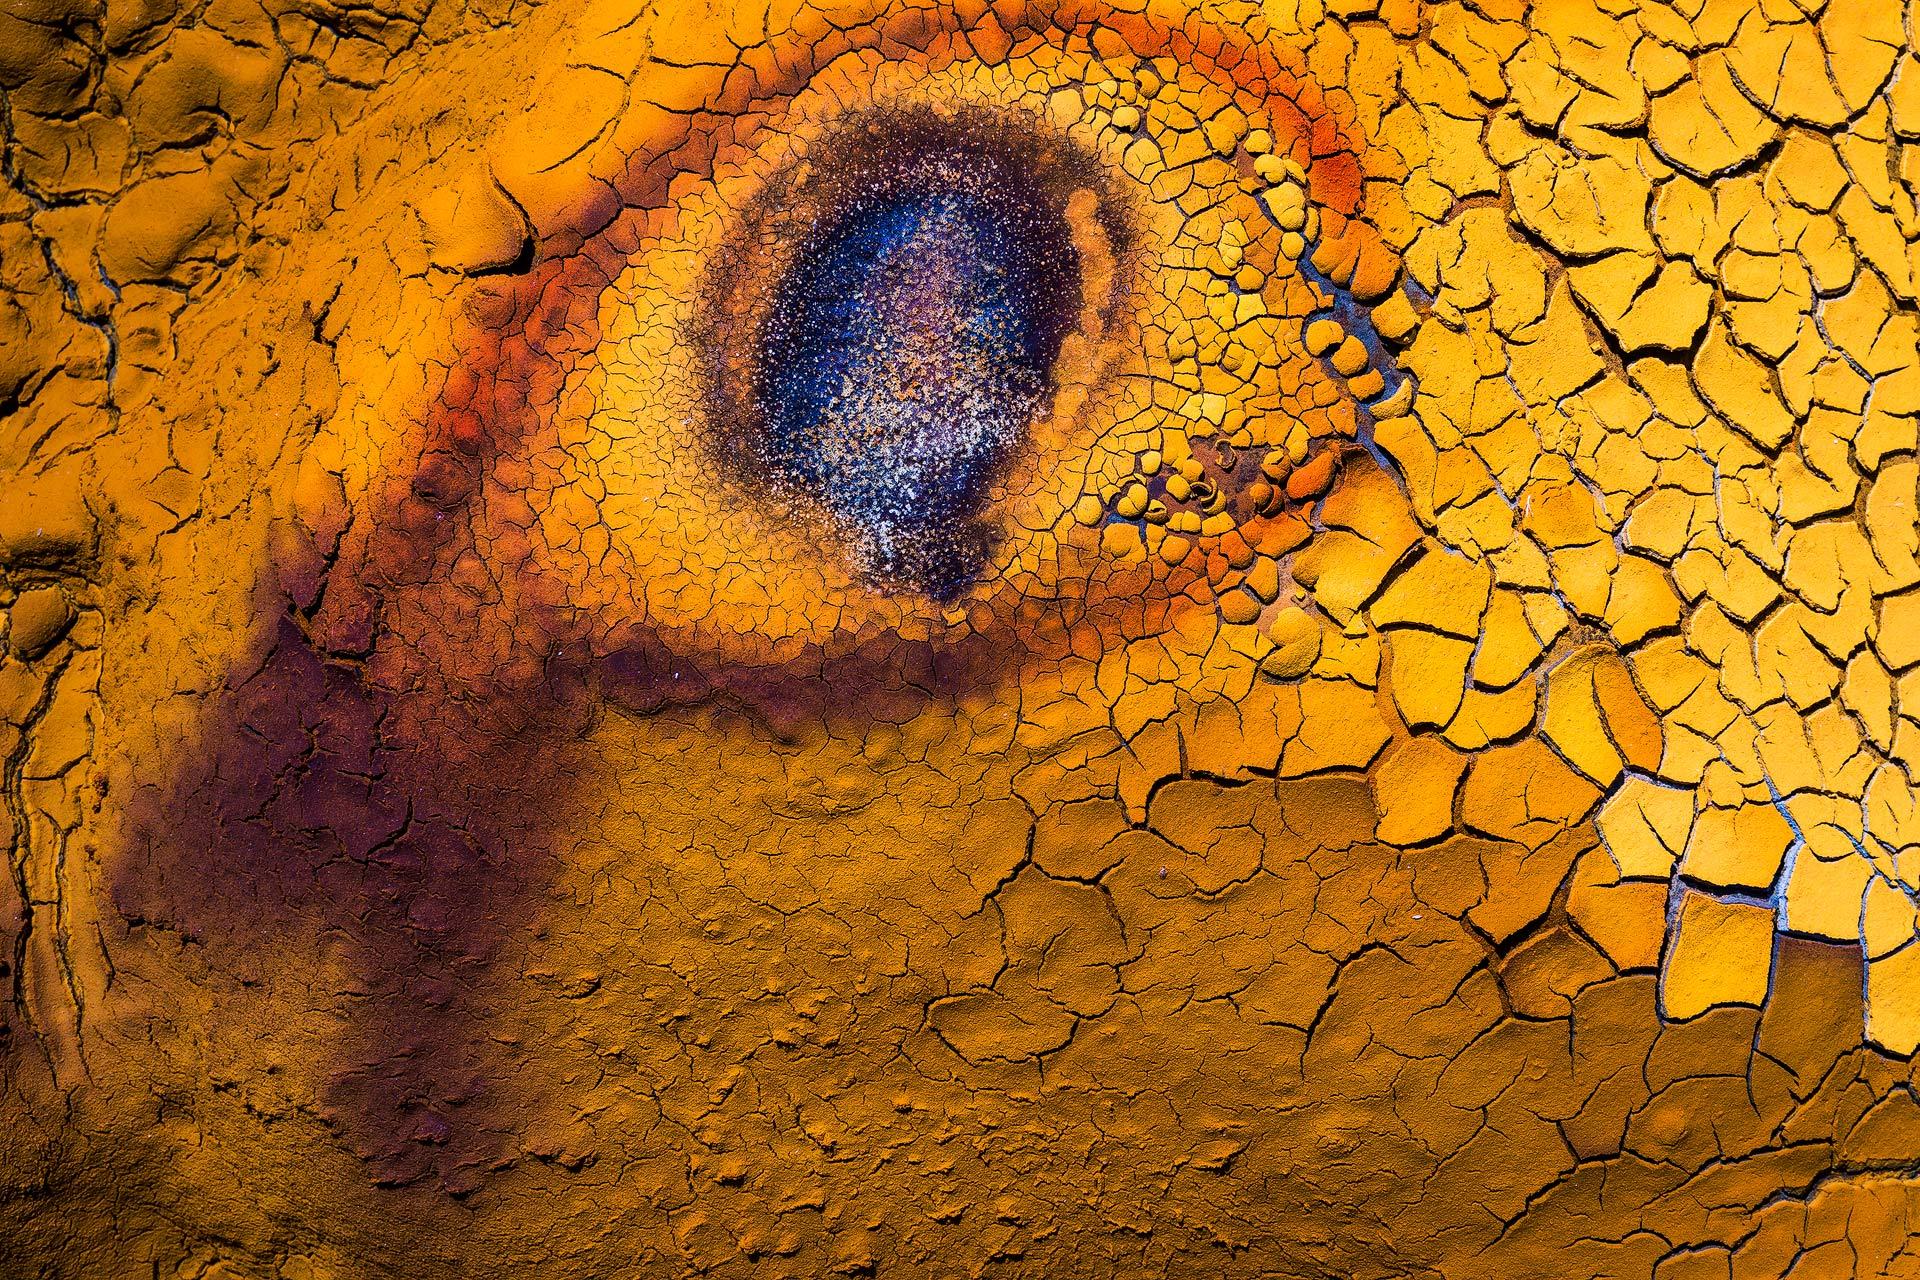 Rio Tinto - Javier Alonso Torre Fotografia de naturaleza rio tinto